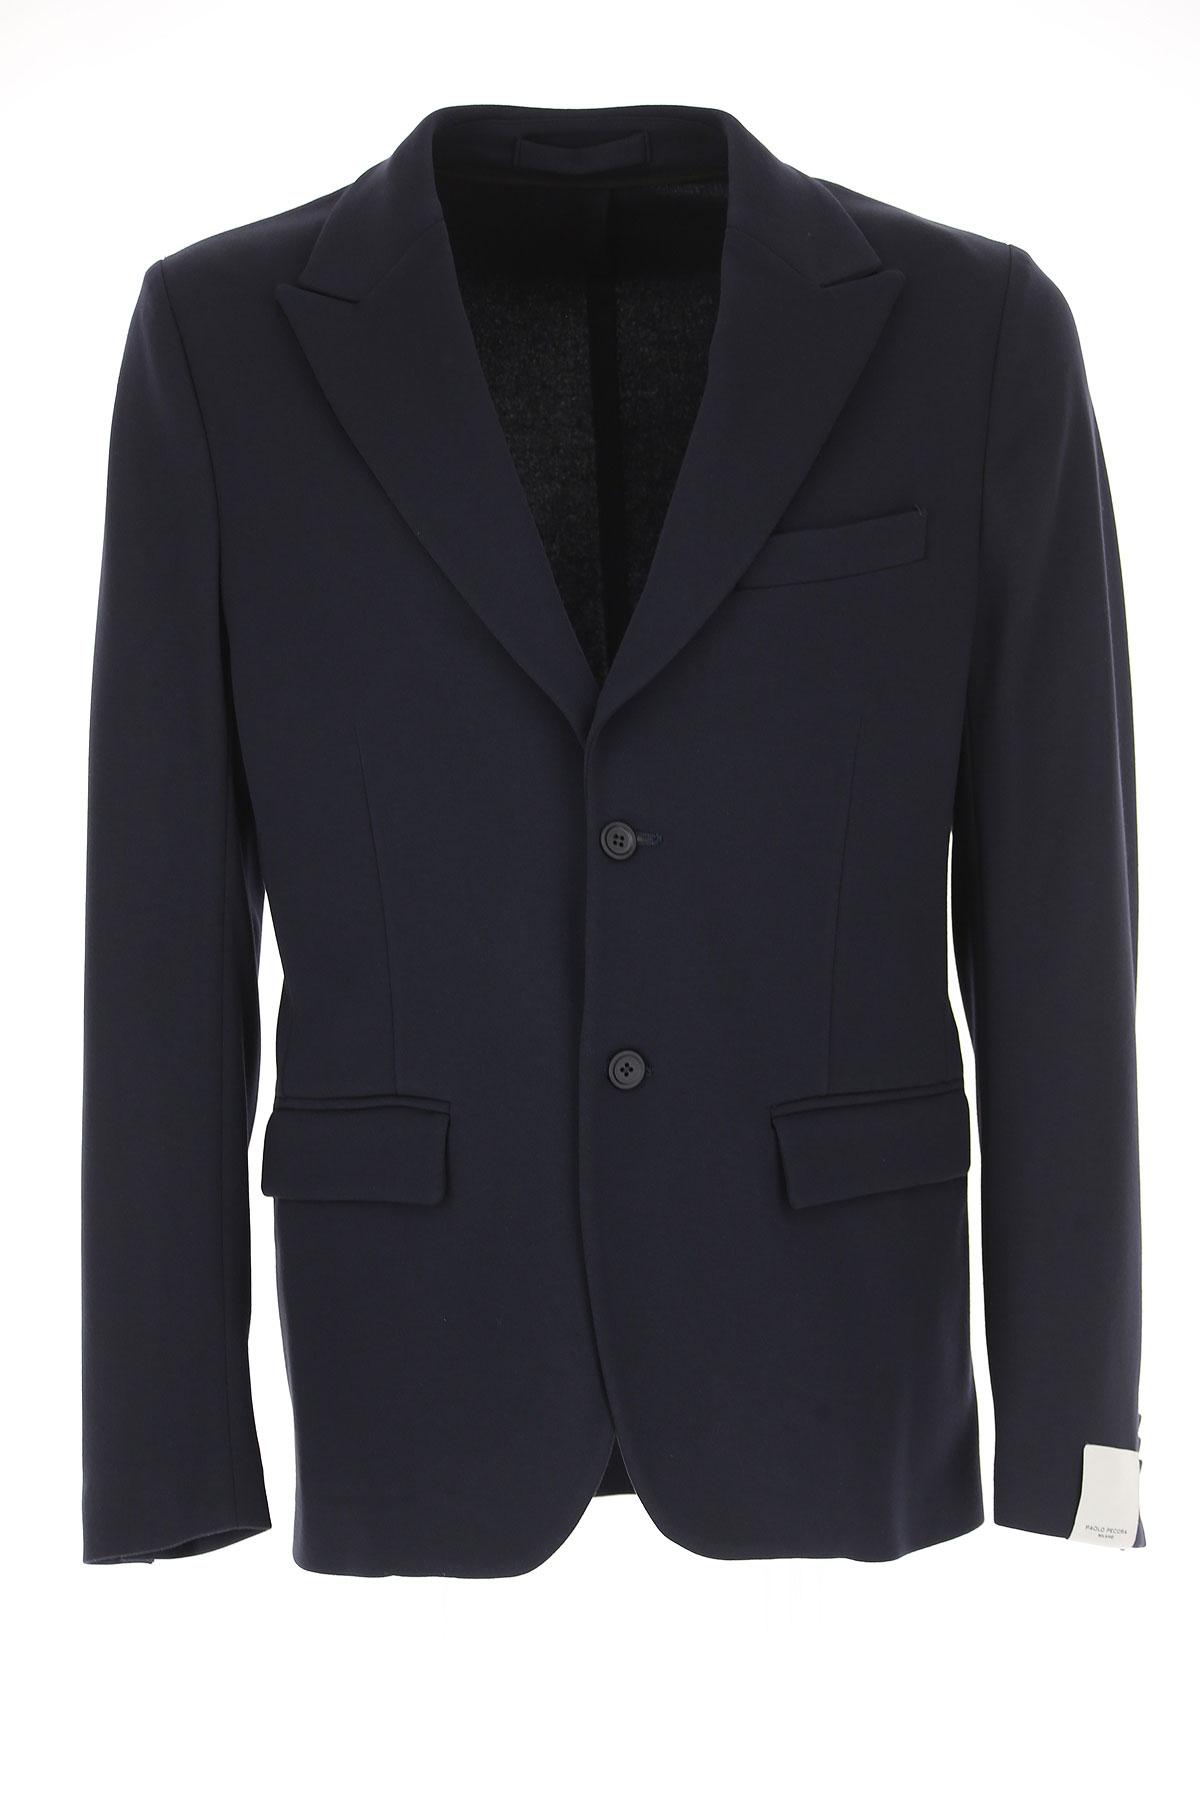 Image of Paolo Pecora Blazer for Men, Sport Coat, Dark Blue, Viscose, 2017, L M S